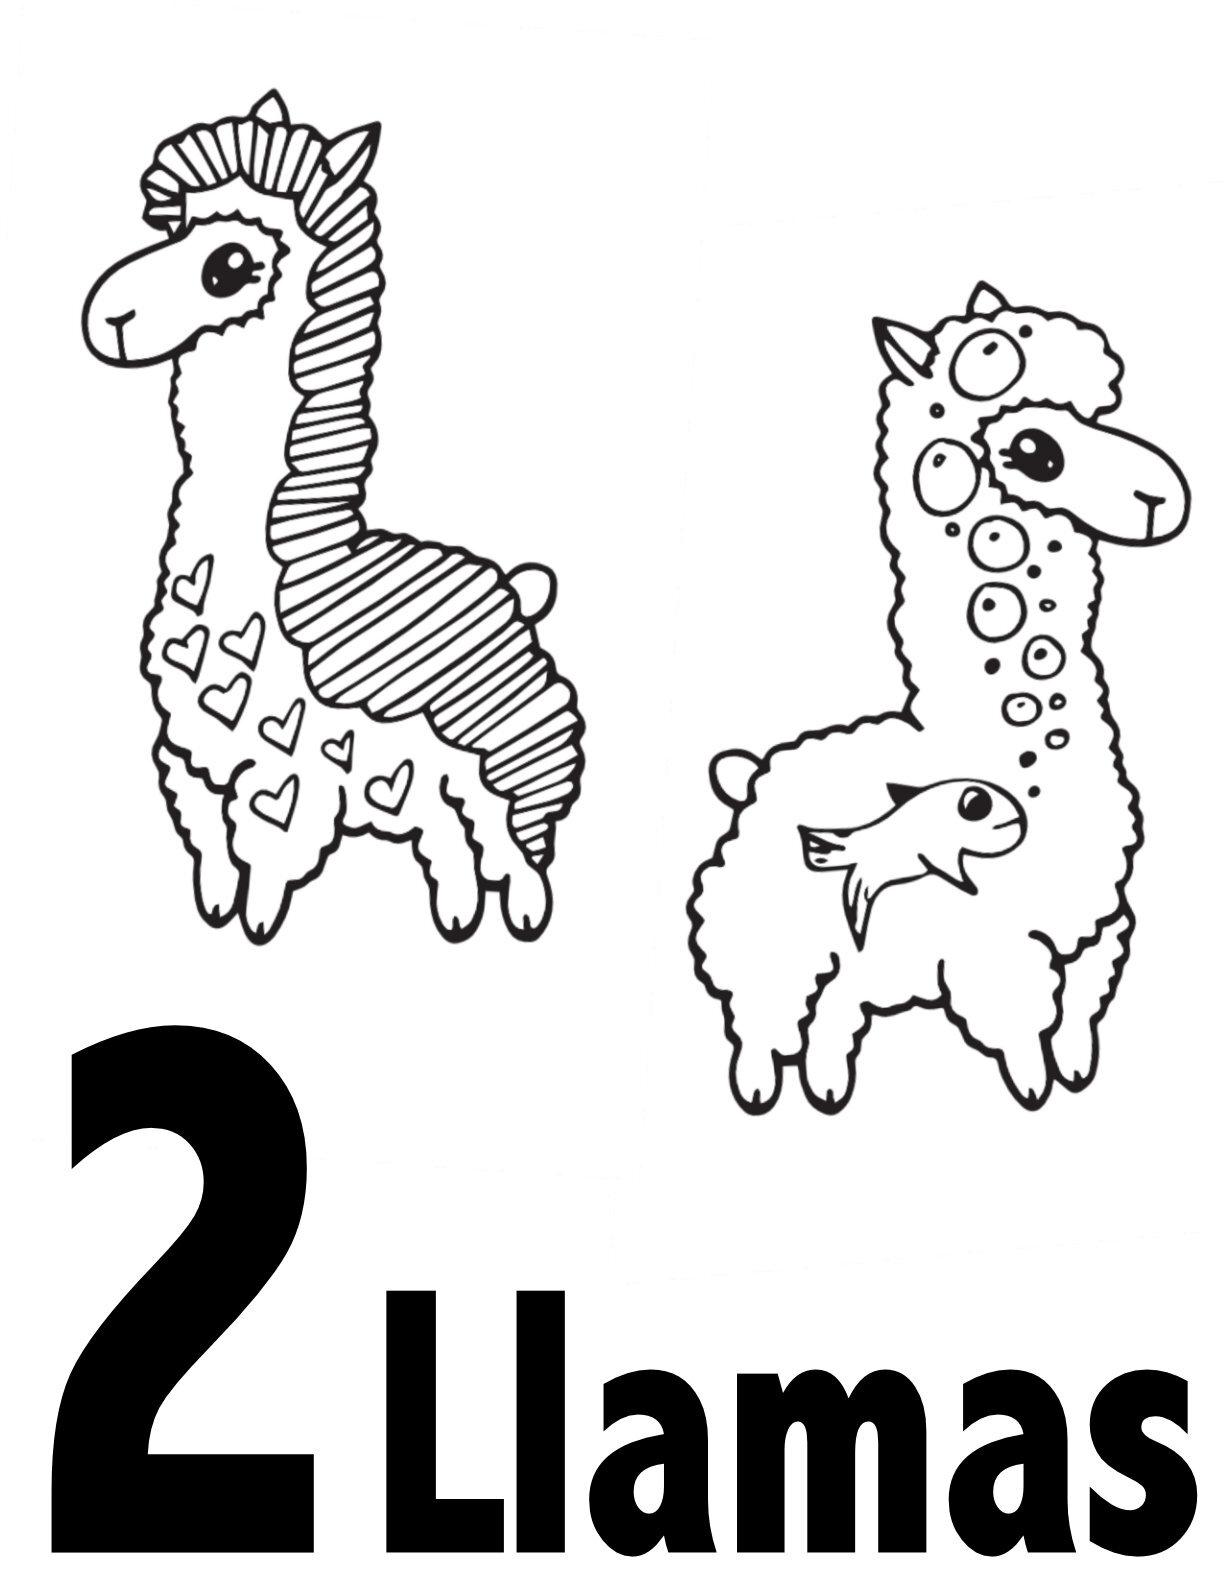 LLAMA Numbers 26-260 - Free Printable Coloring Pages Preschool